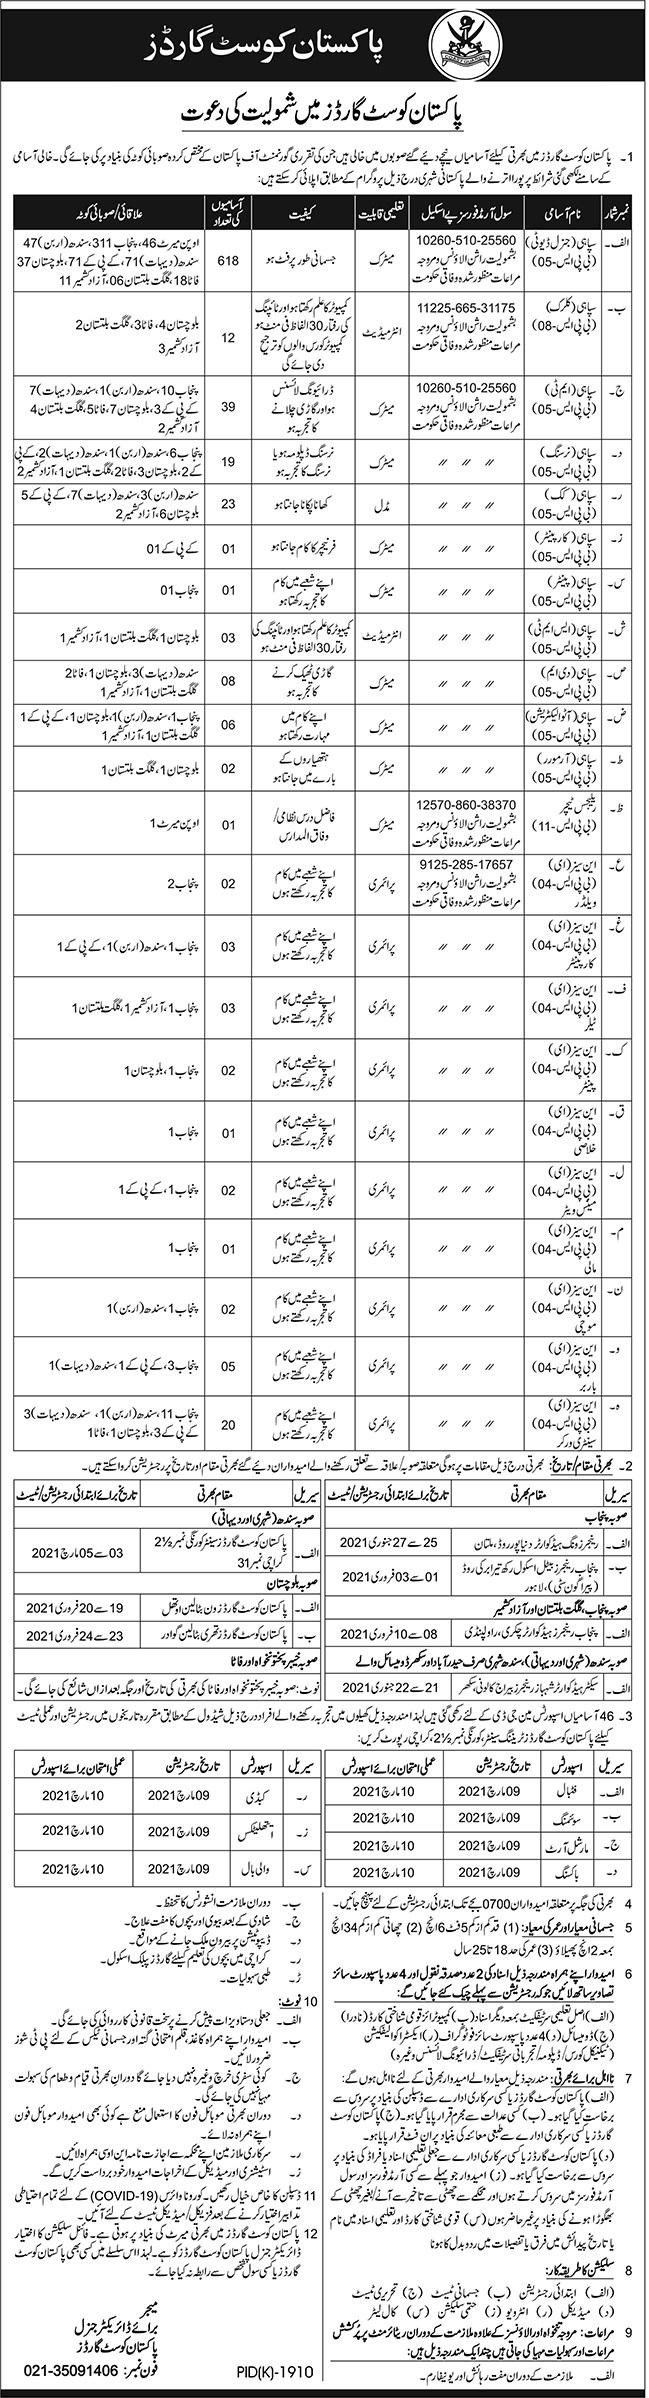 How to Apply for Pakistani Coast Guard Jobs 2021 - PCG Jobs 2021-774 + New Pakistani Coast Guard Jobs PCG Jobs 2021-2021 Coast Guard Jobs